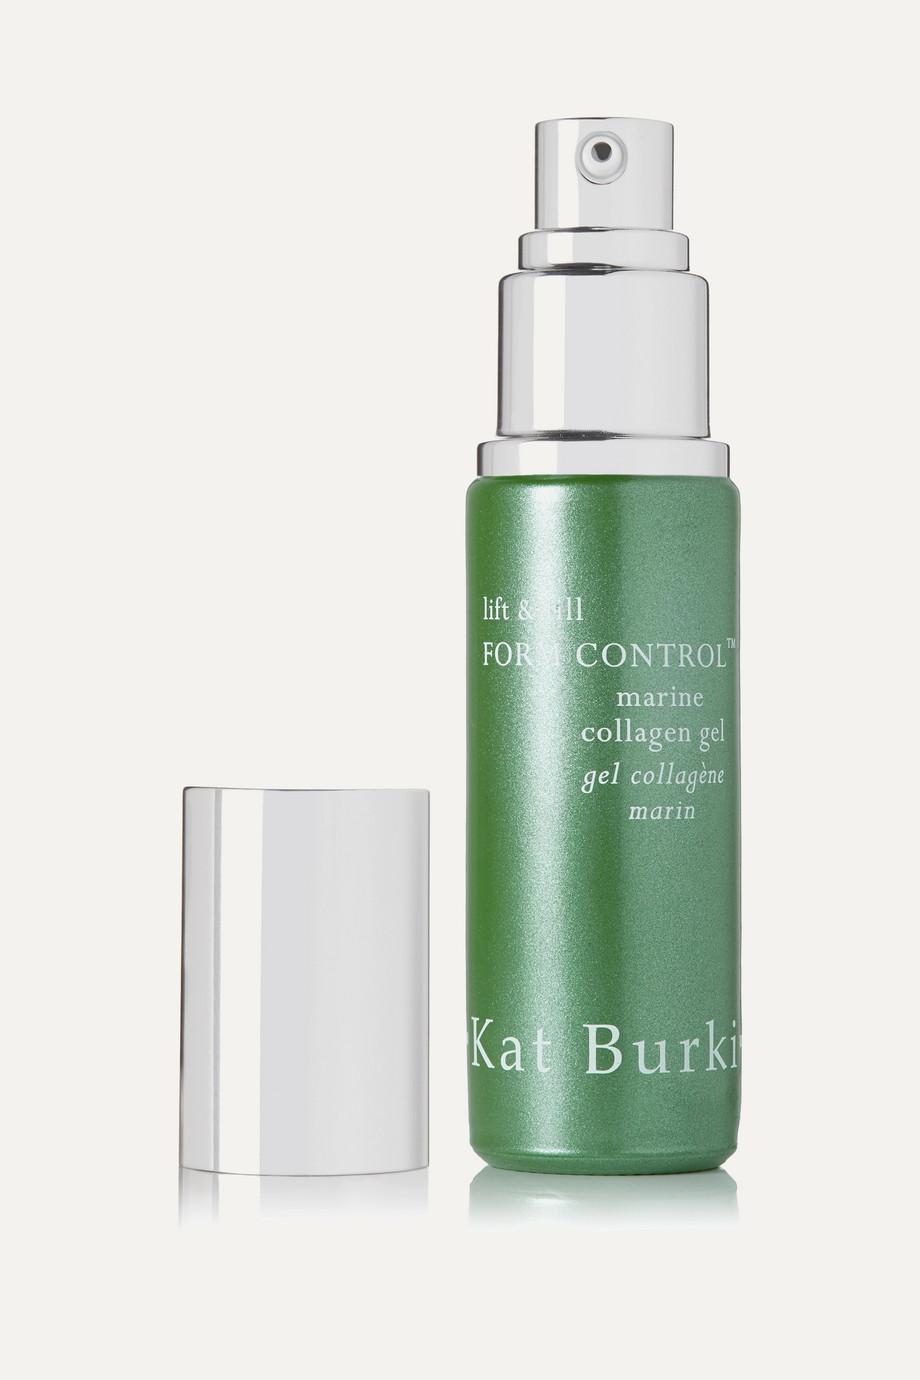 Kat Burki Form Control Marine Collagen Gel, 30 ml – Gel